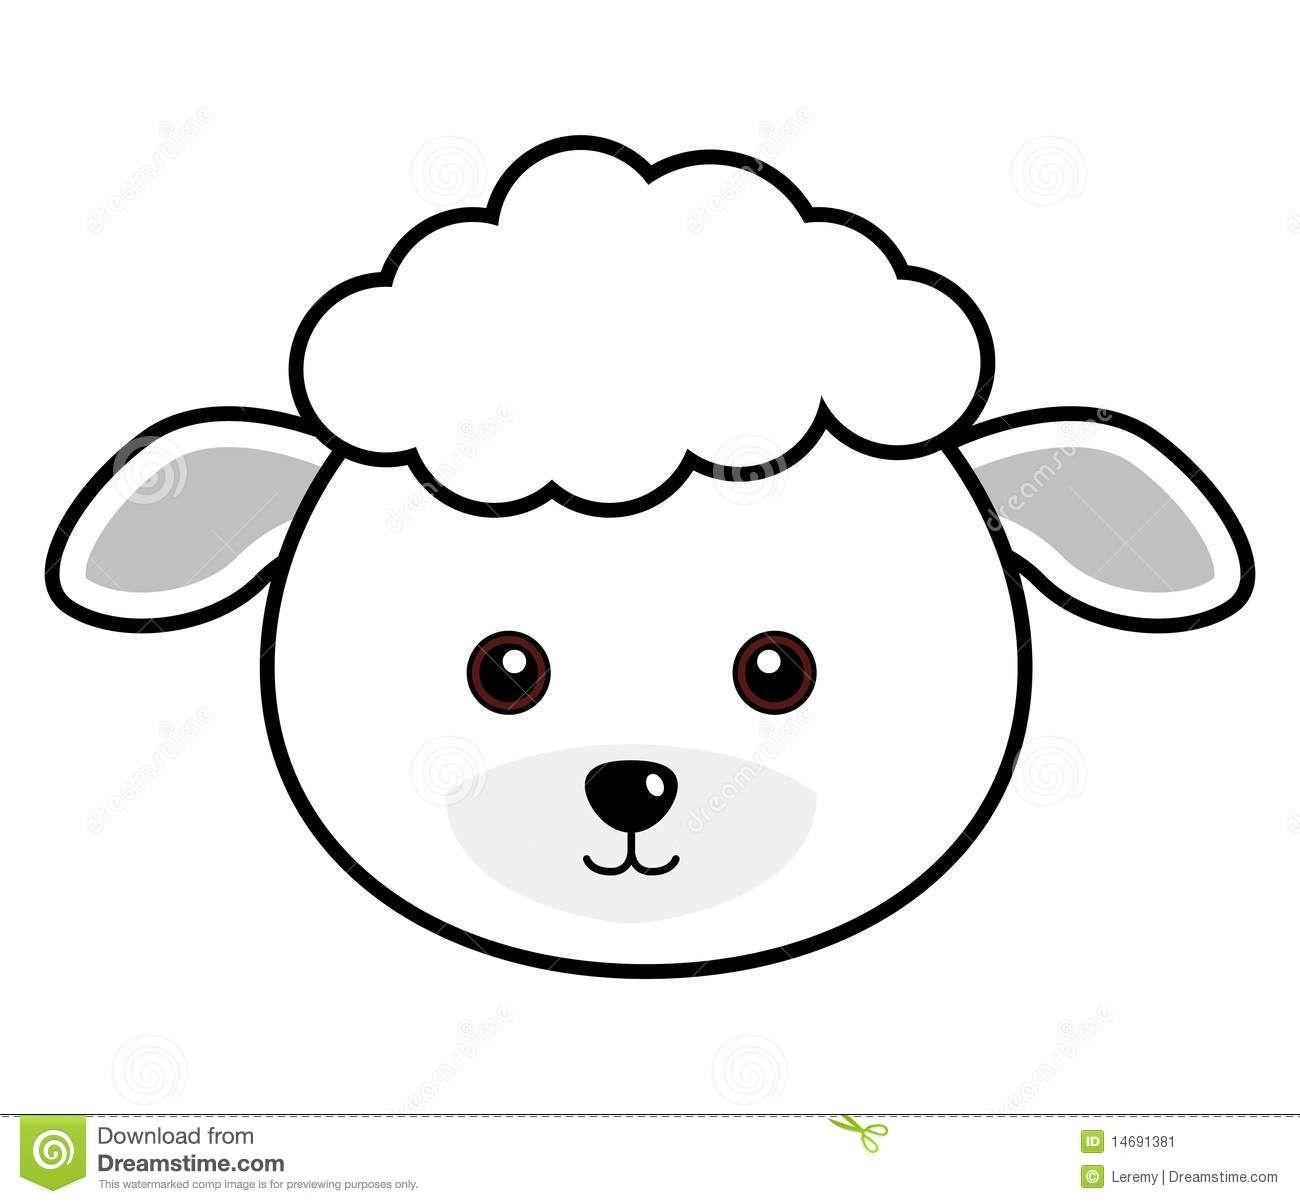 Cute Sheep Face | Plaasdiere | Sheep Face, Sheep Crafts, Face Template - Free Printable Sheep Mask